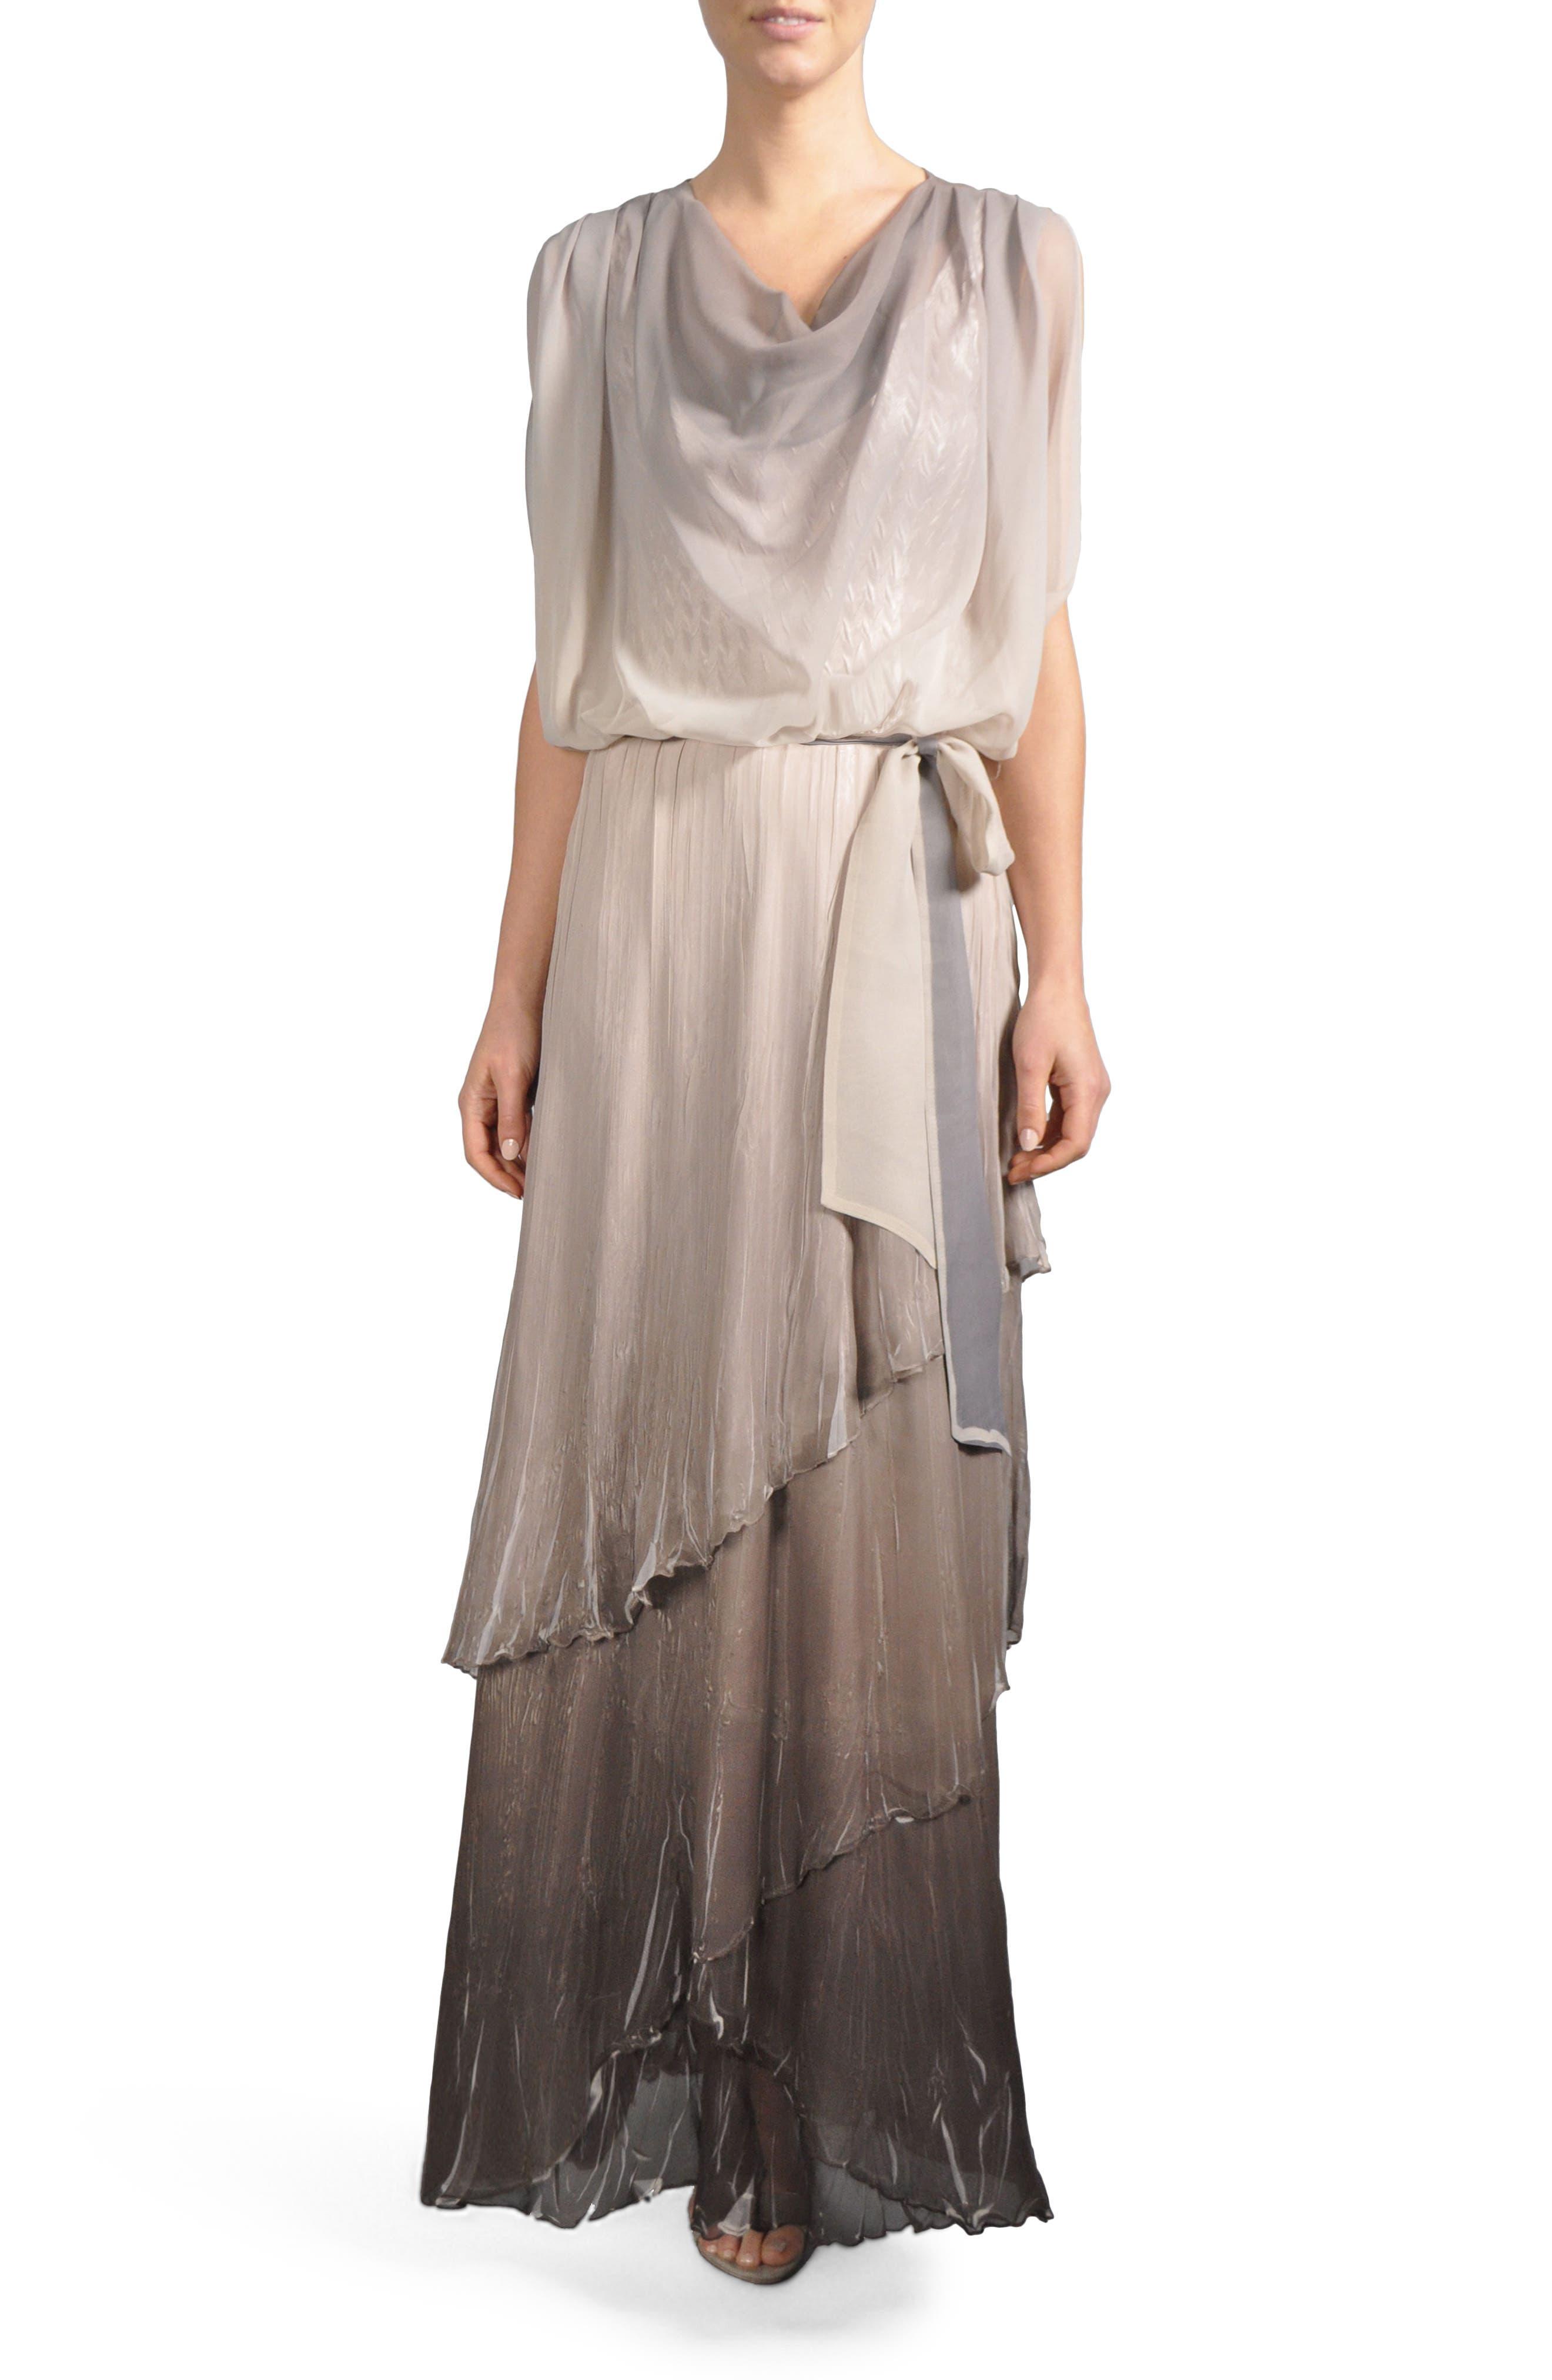 Ombré Tiered Skirt Blouson Gown,                             Main thumbnail 1, color,                             057